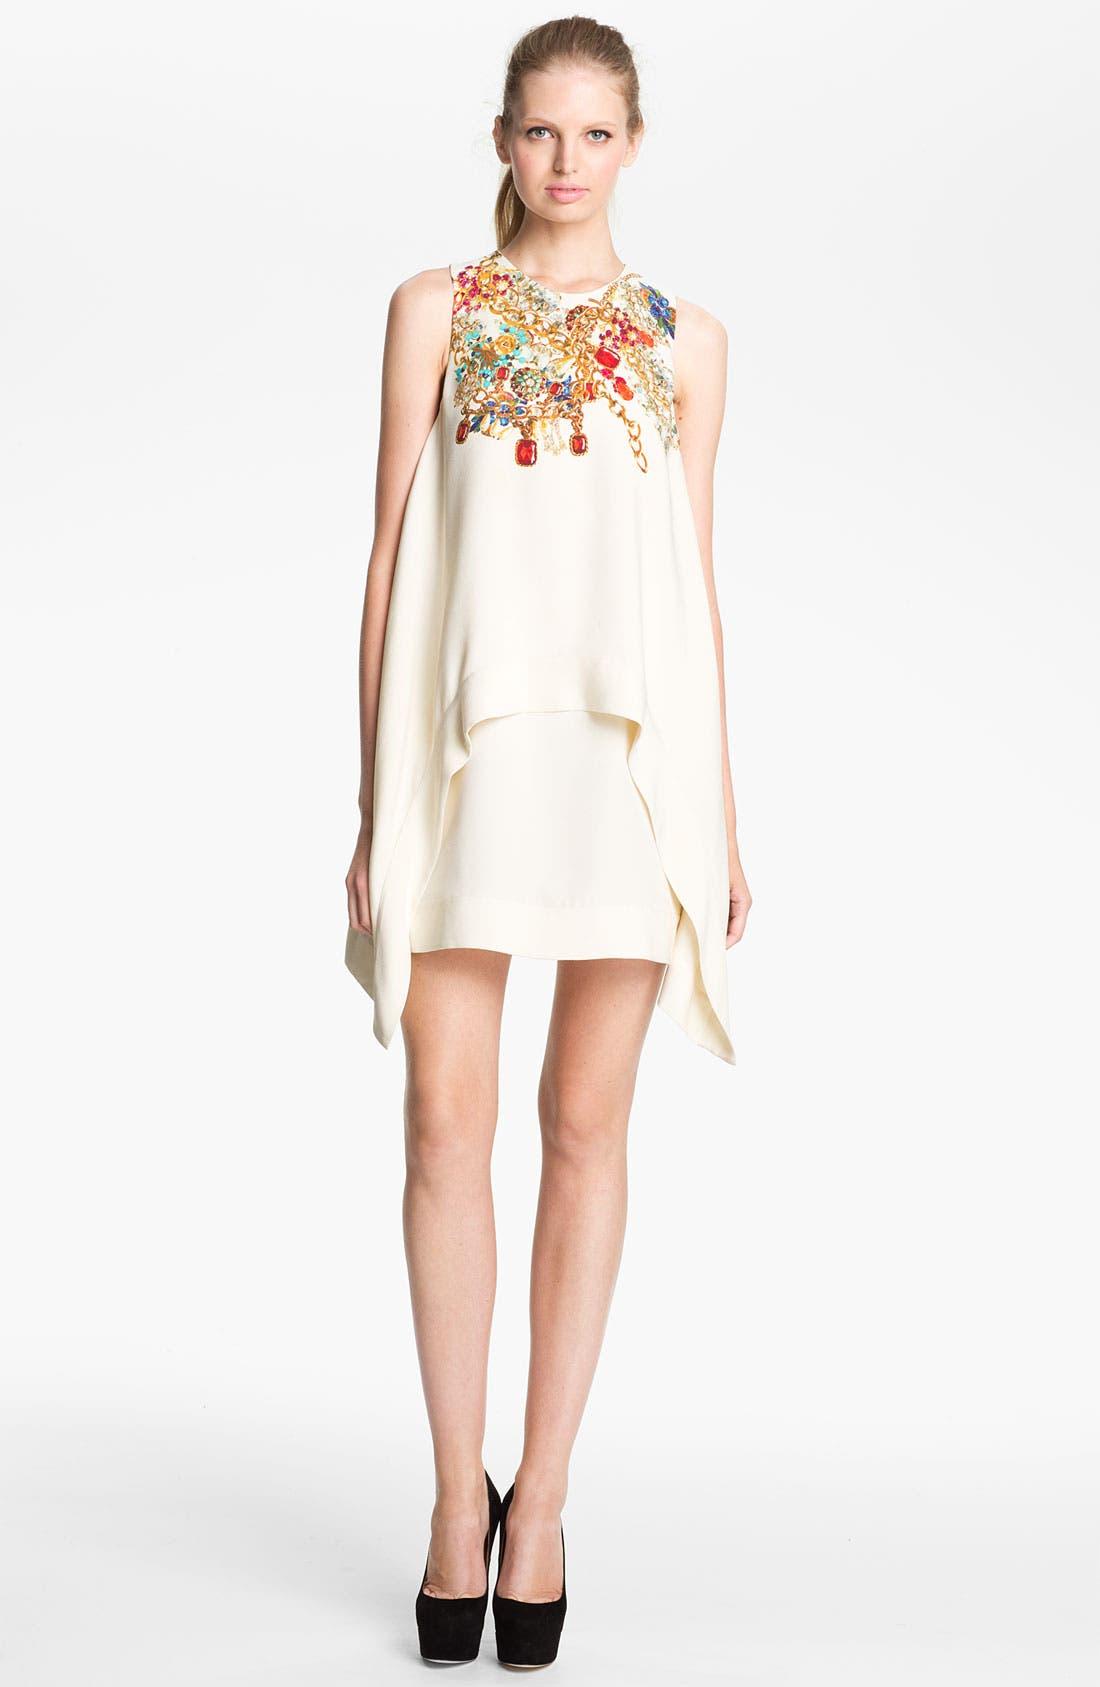 Alternate Image 1 Selected - camilla and marc 'Adorned' Jewel Print Draped Dress